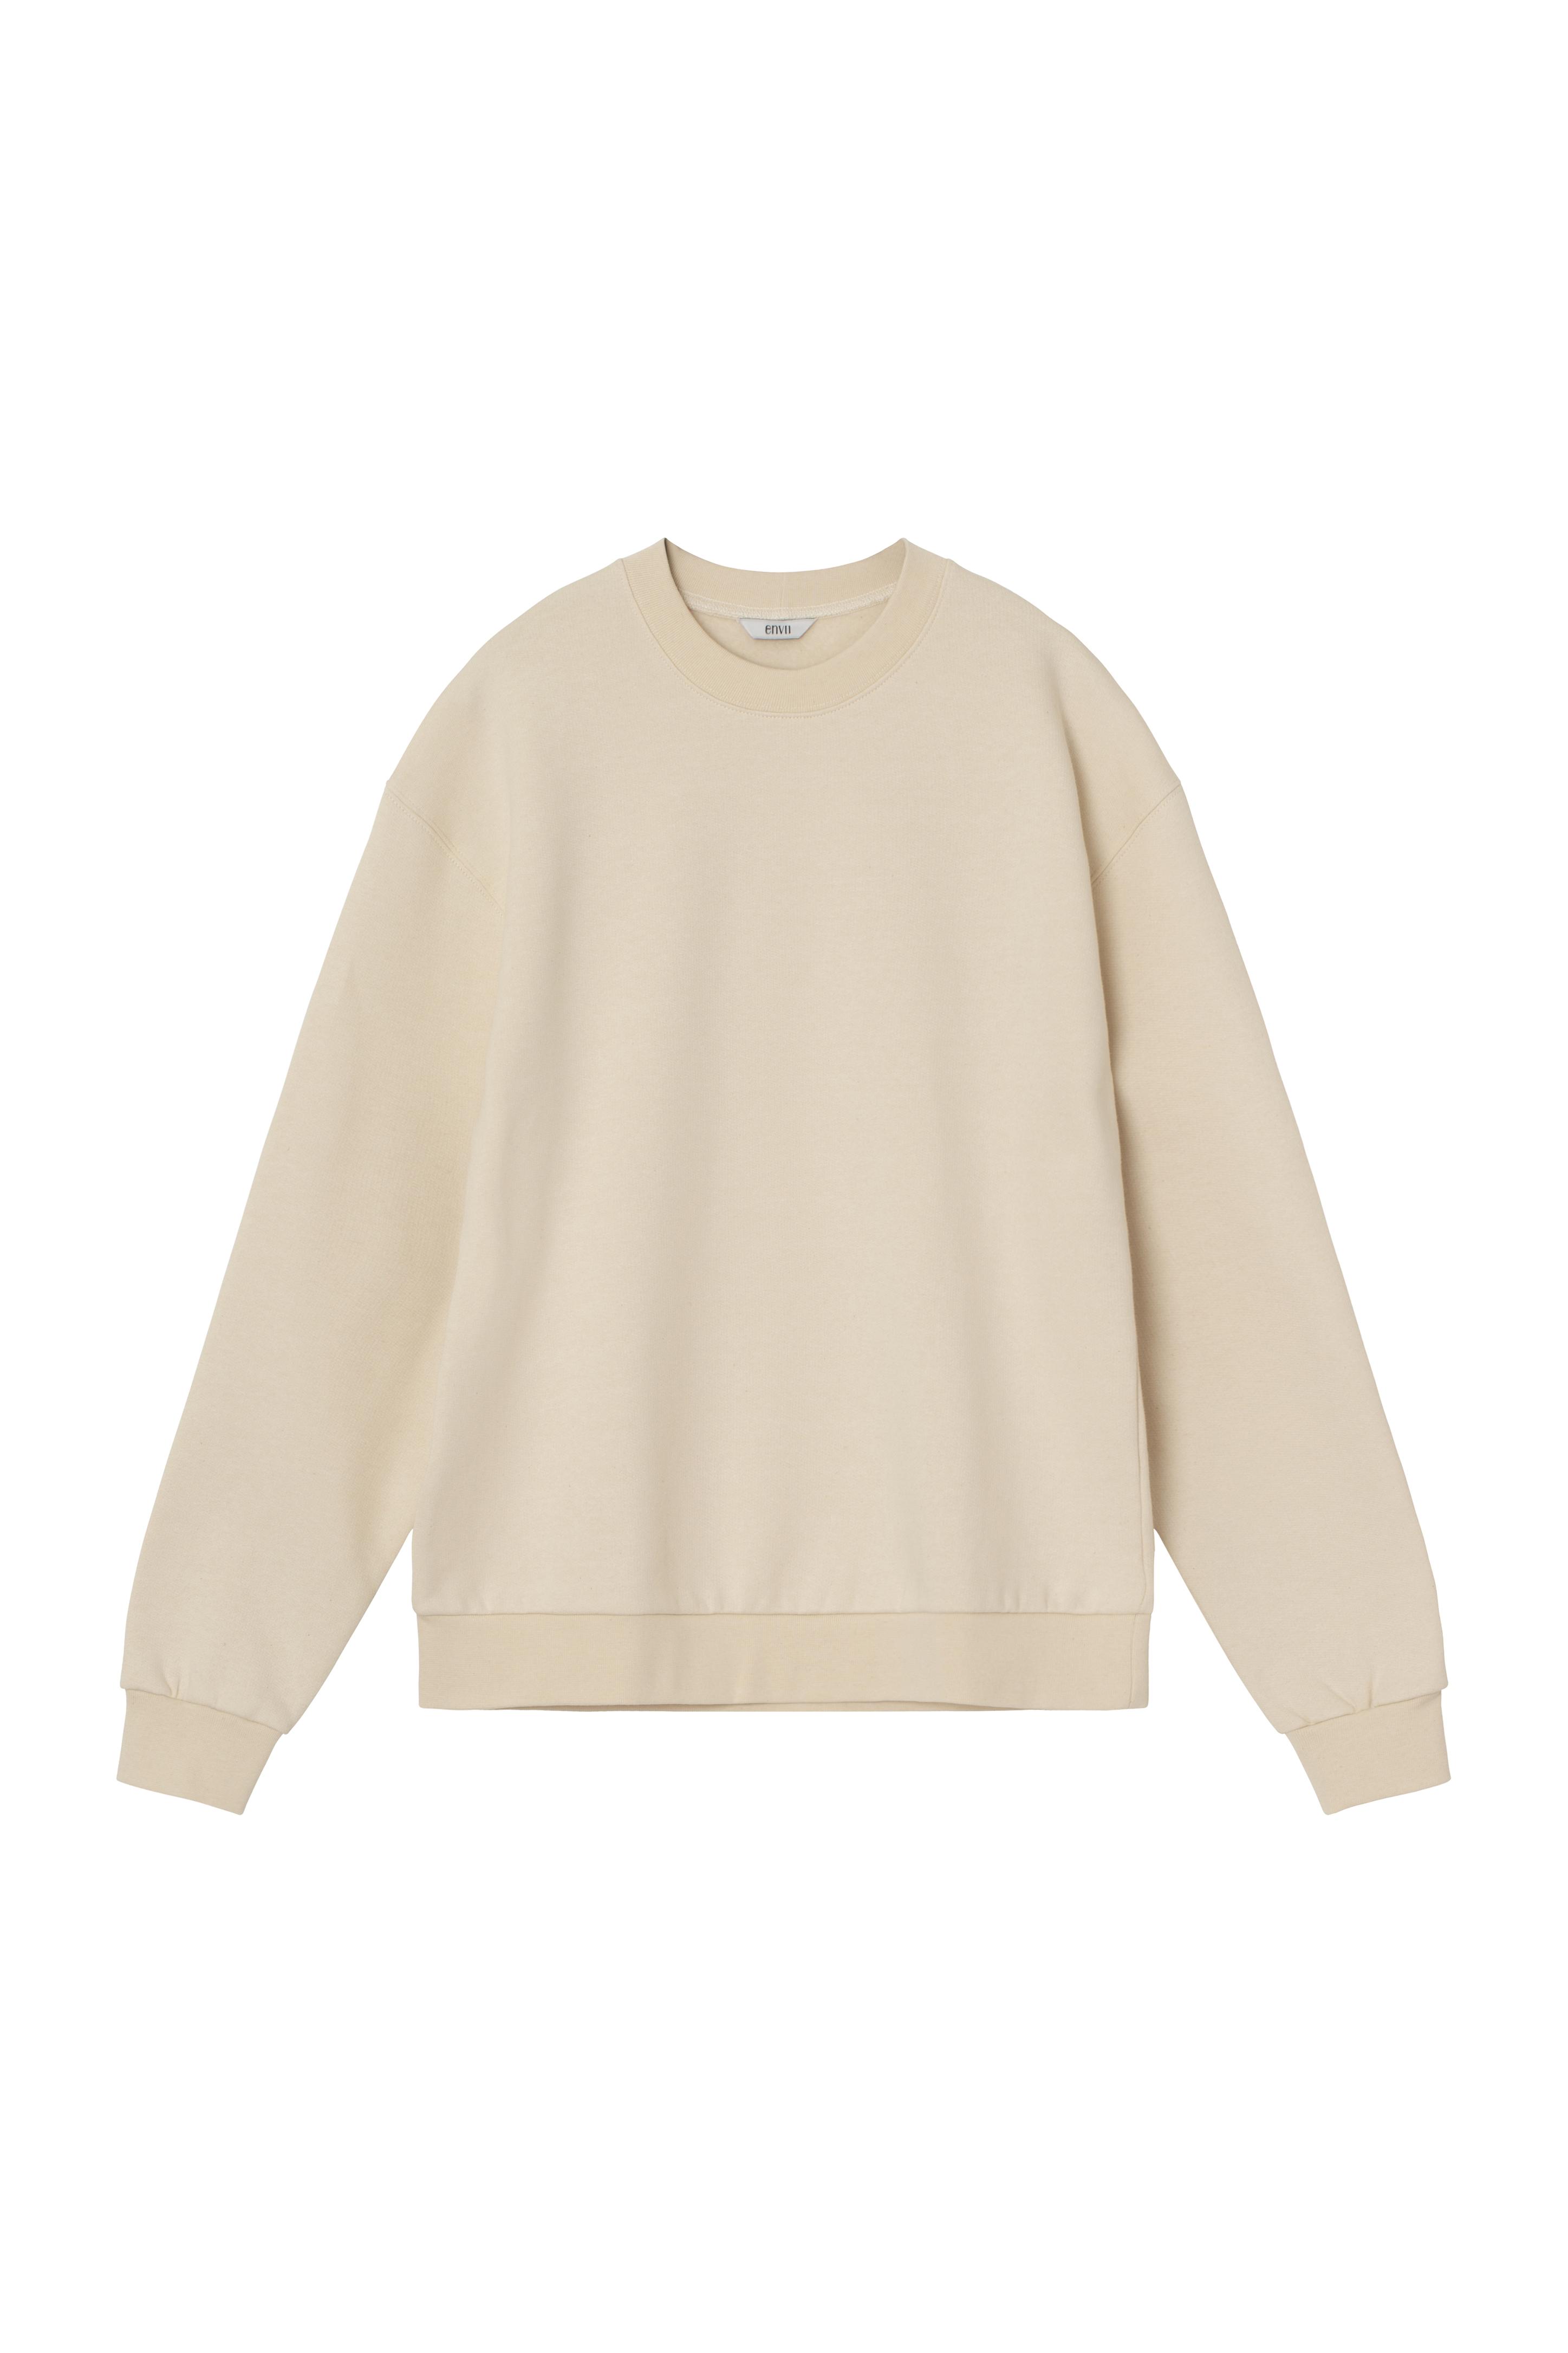 Envii Enmonroe sweatshirt